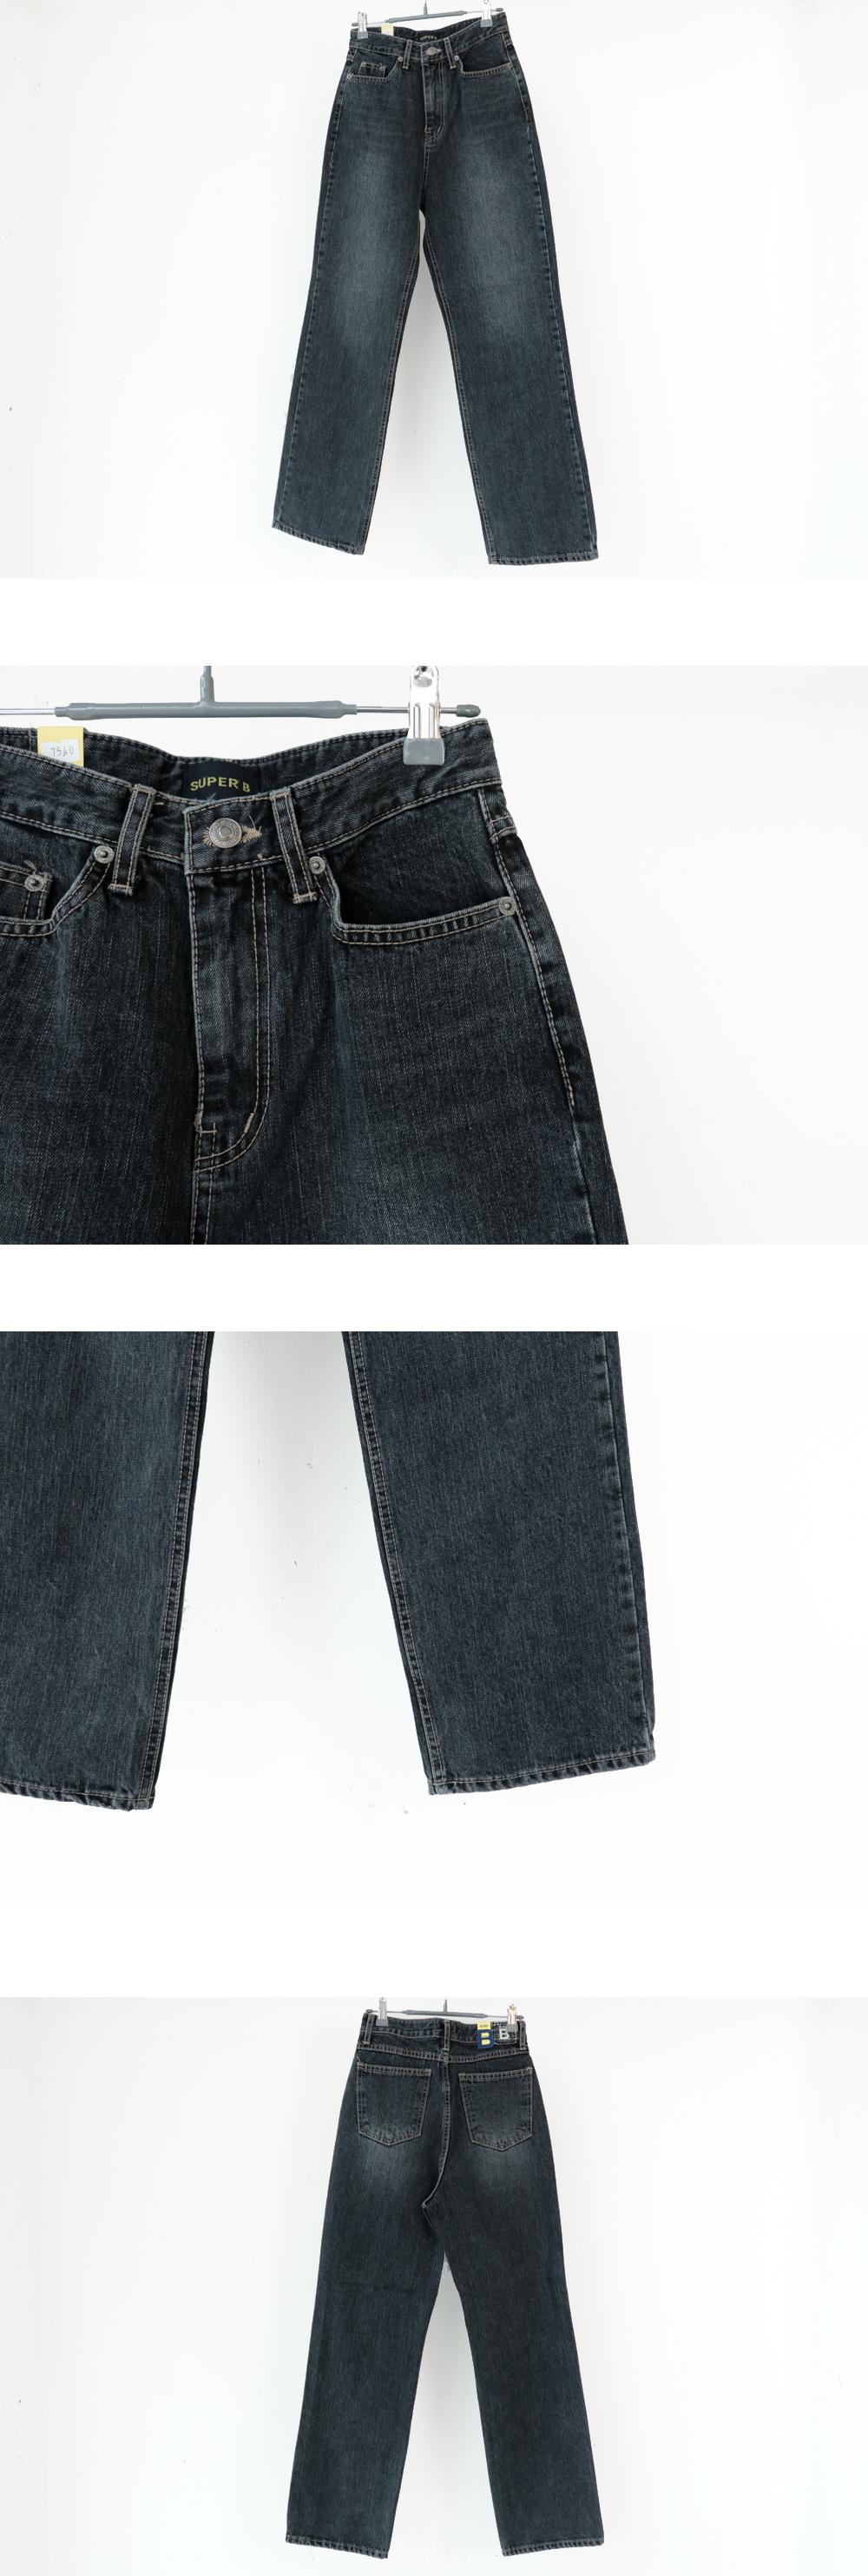 7540 straight wide denim pants